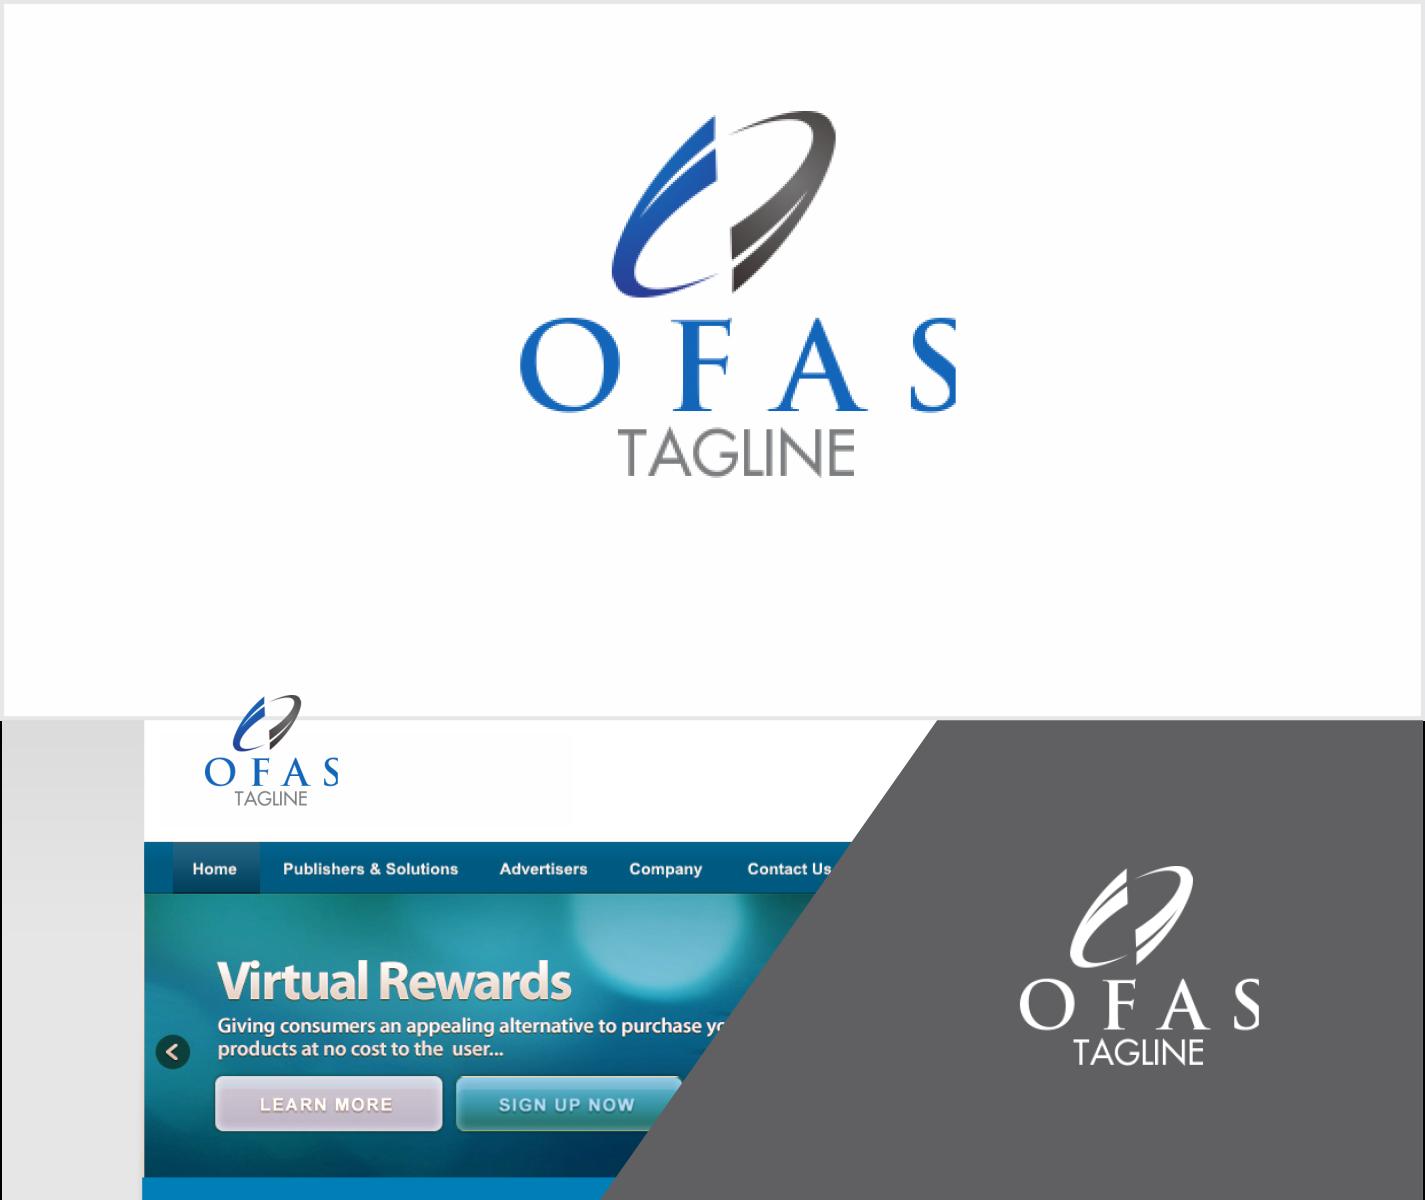 Elegant, Modern, Online Logo Design for OFAS by Toto luap- | Design ...